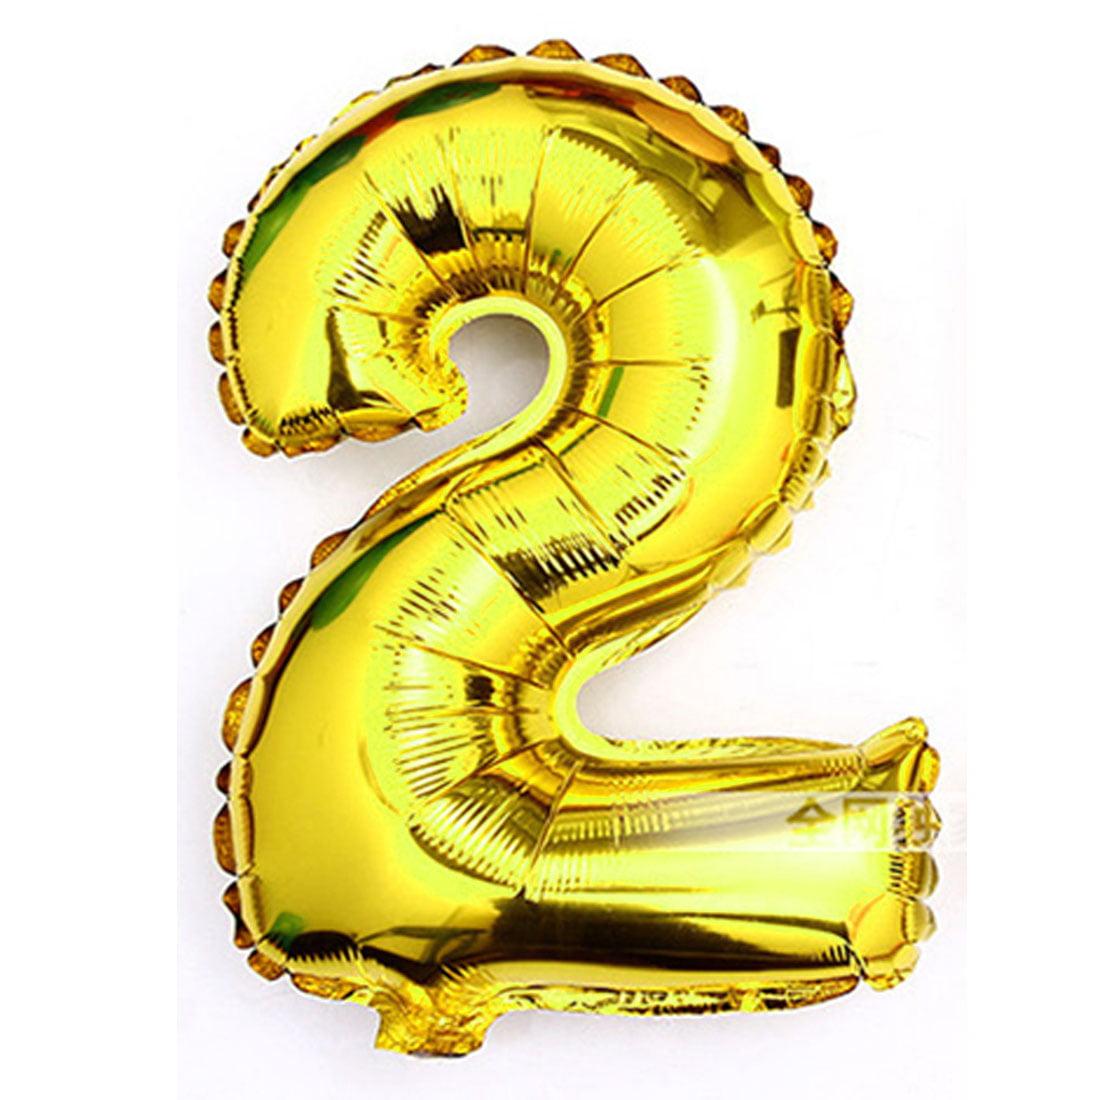 "Unique Bargains Foil Number 2 Shape Helium Balloon Birthday Wedding Party Decor Gold Tone 30"""